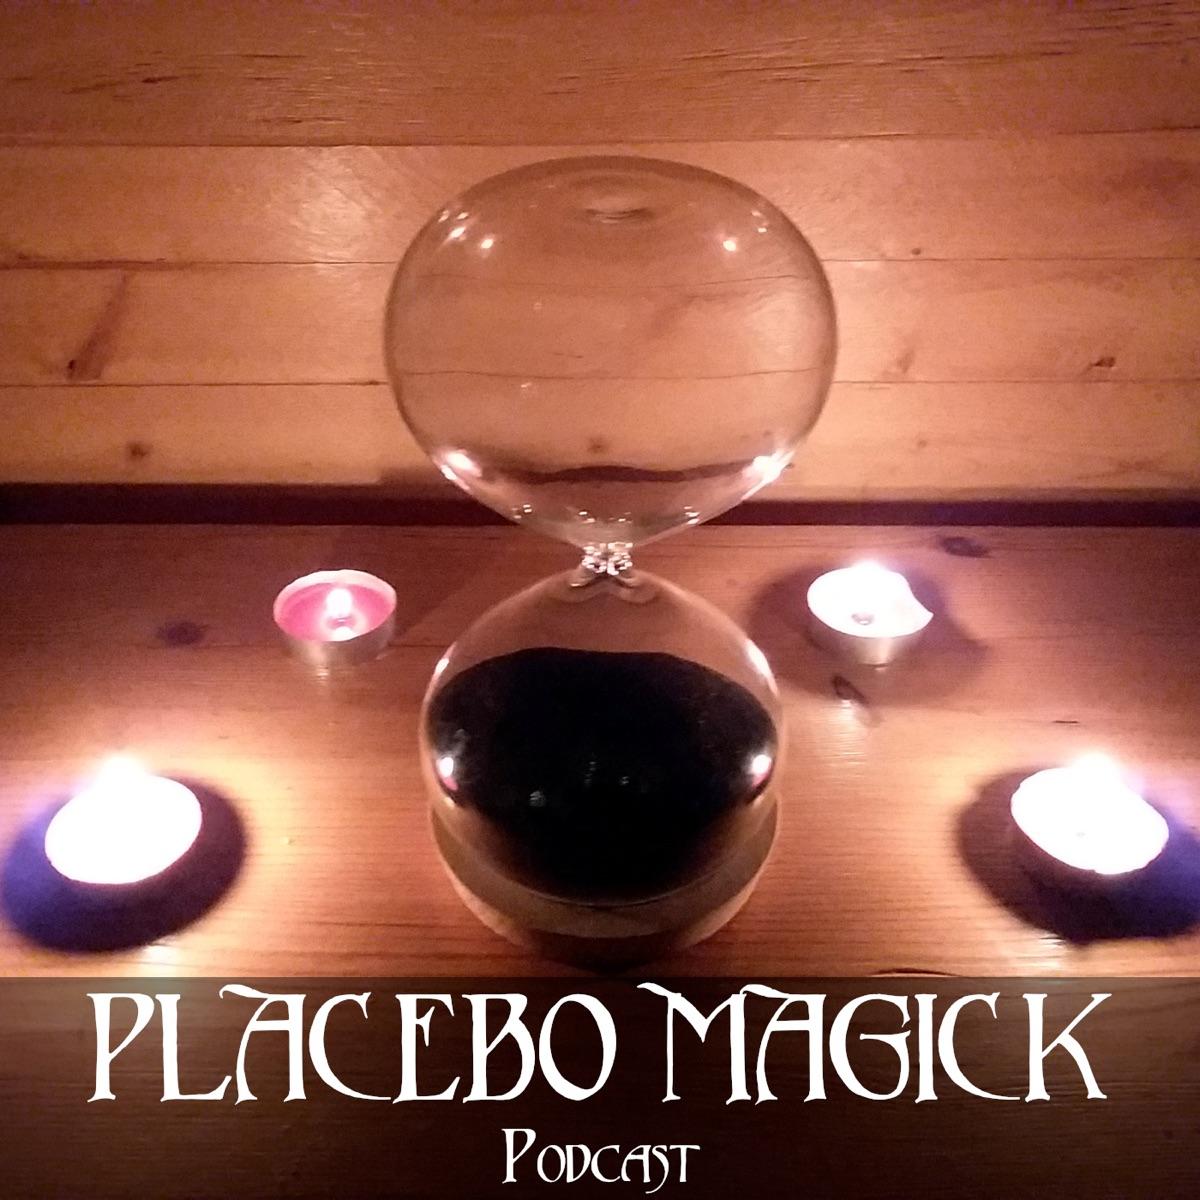 Placebo Magick Podcast – Podcast – Podtail